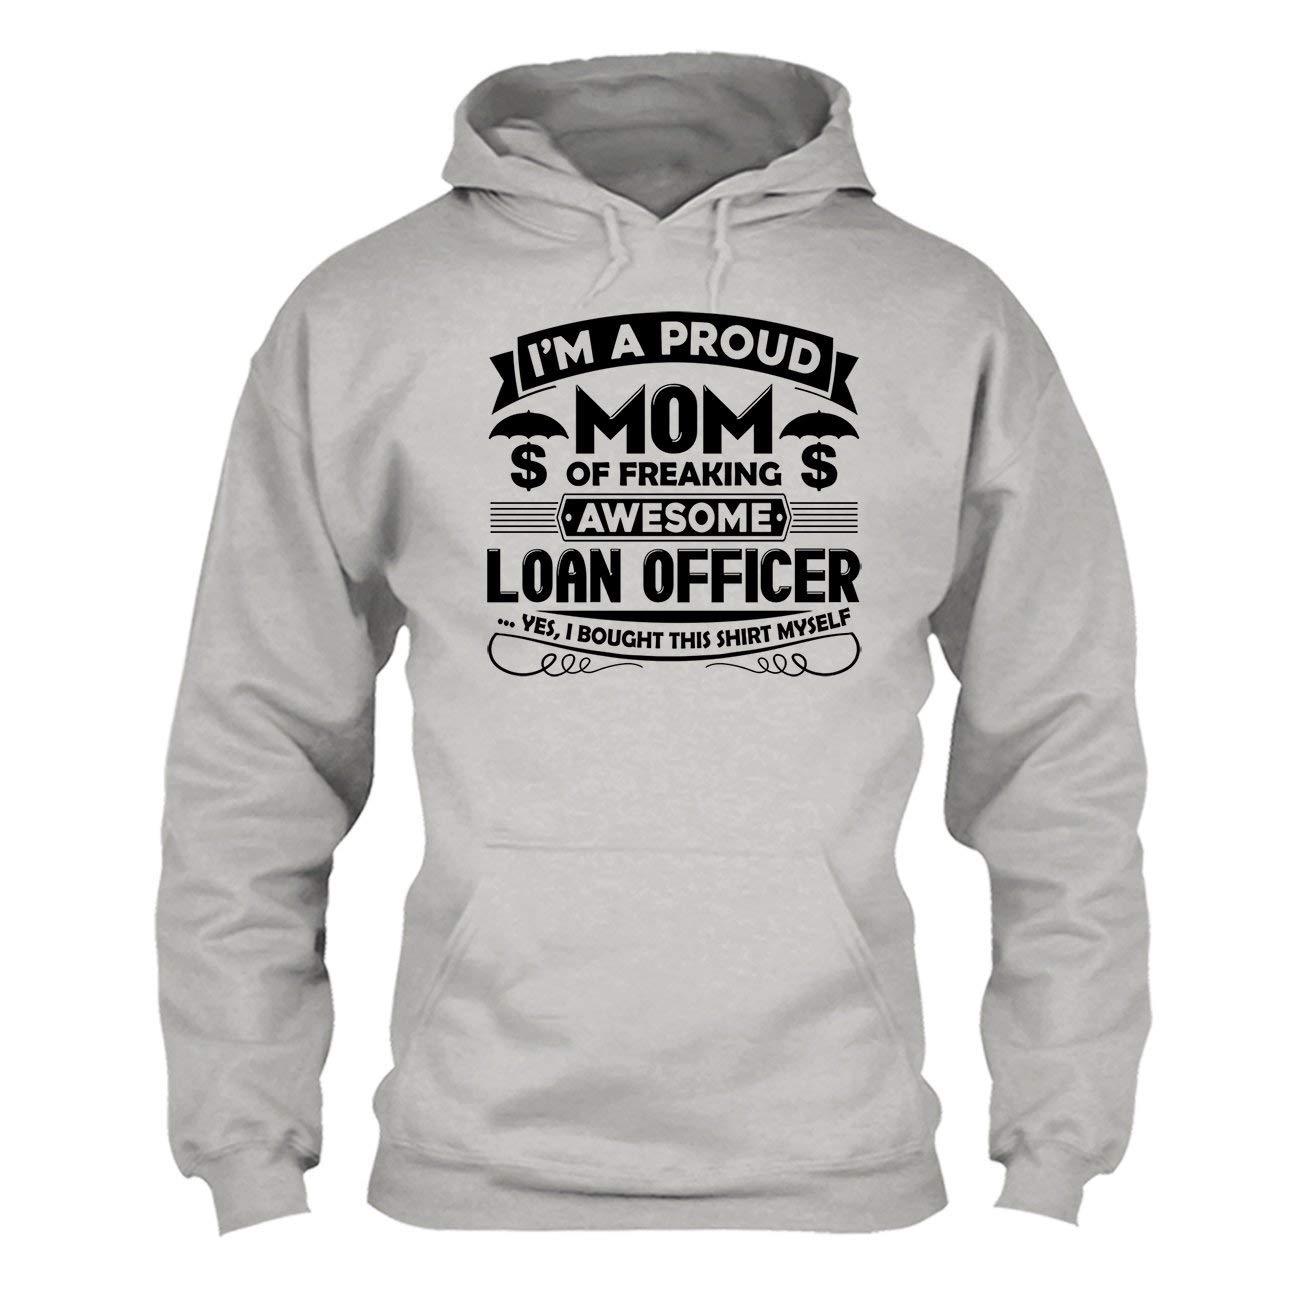 Awesome Loan Officer Mom Tee Shirt Sweatshirt Hoodie